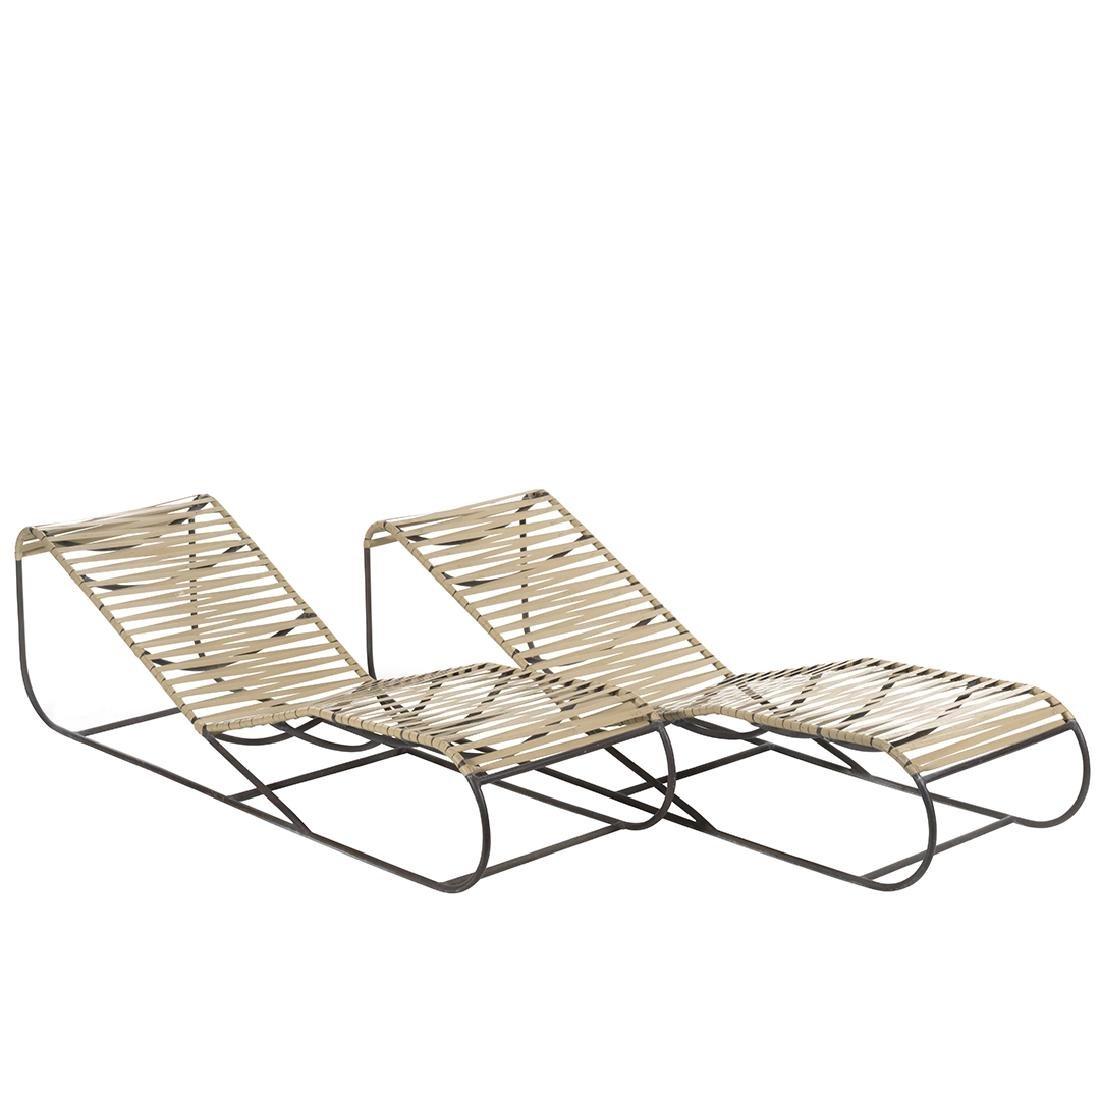 Kipp Stewart Bronze Chaise Lounges (2)